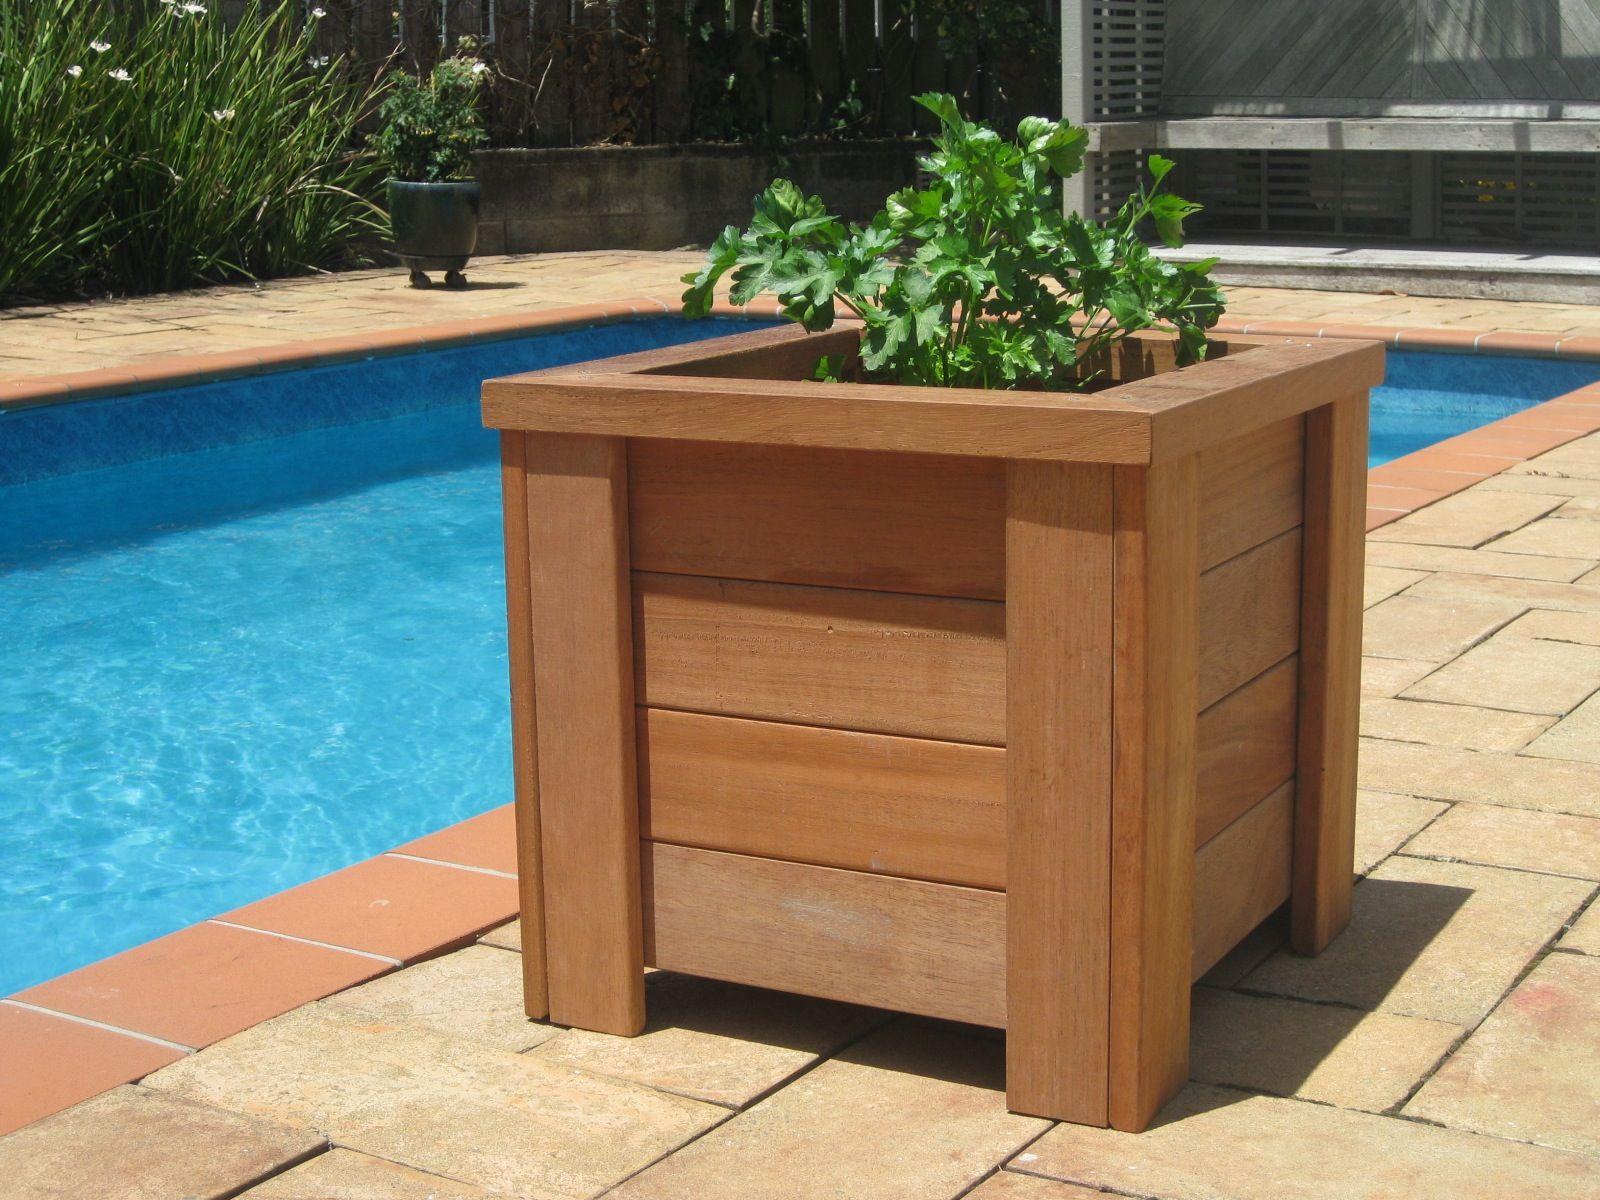 planters boxes google search planter boxes wooden. Black Bedroom Furniture Sets. Home Design Ideas